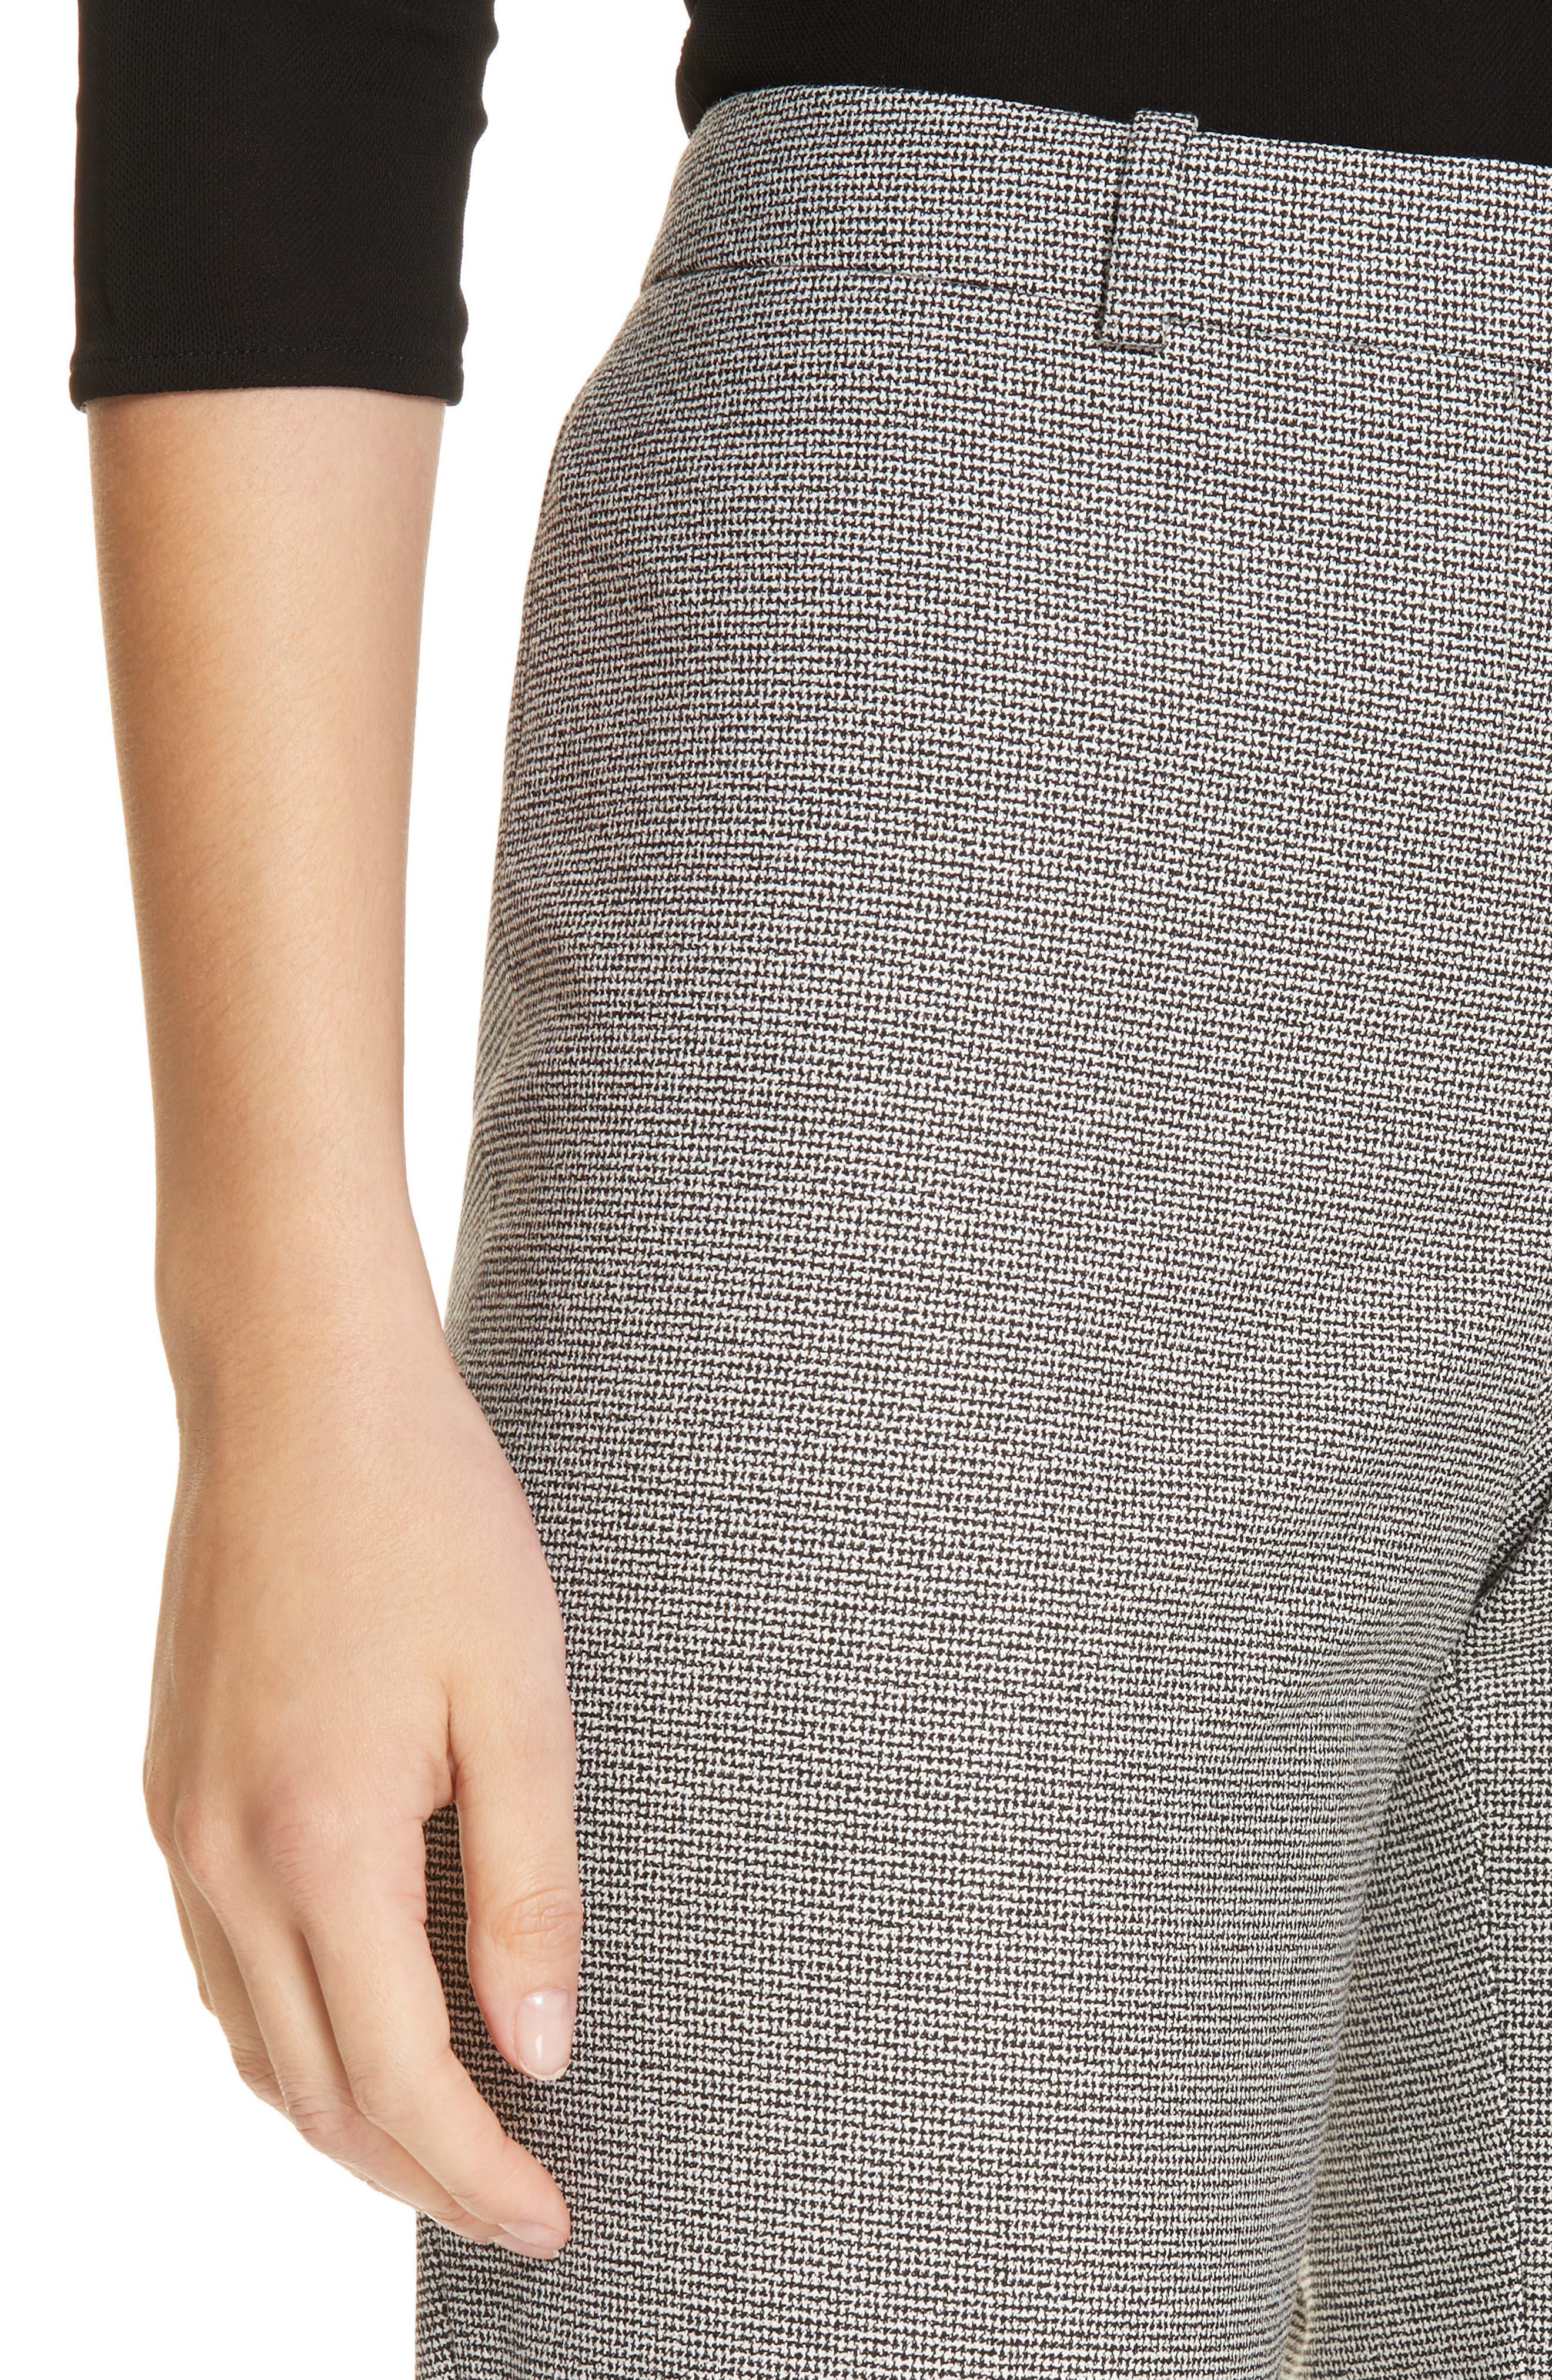 Tulea Blurred Optic Wool Suiting Trousers,                             Alternate thumbnail 4, color,                             BLACK FANTASY